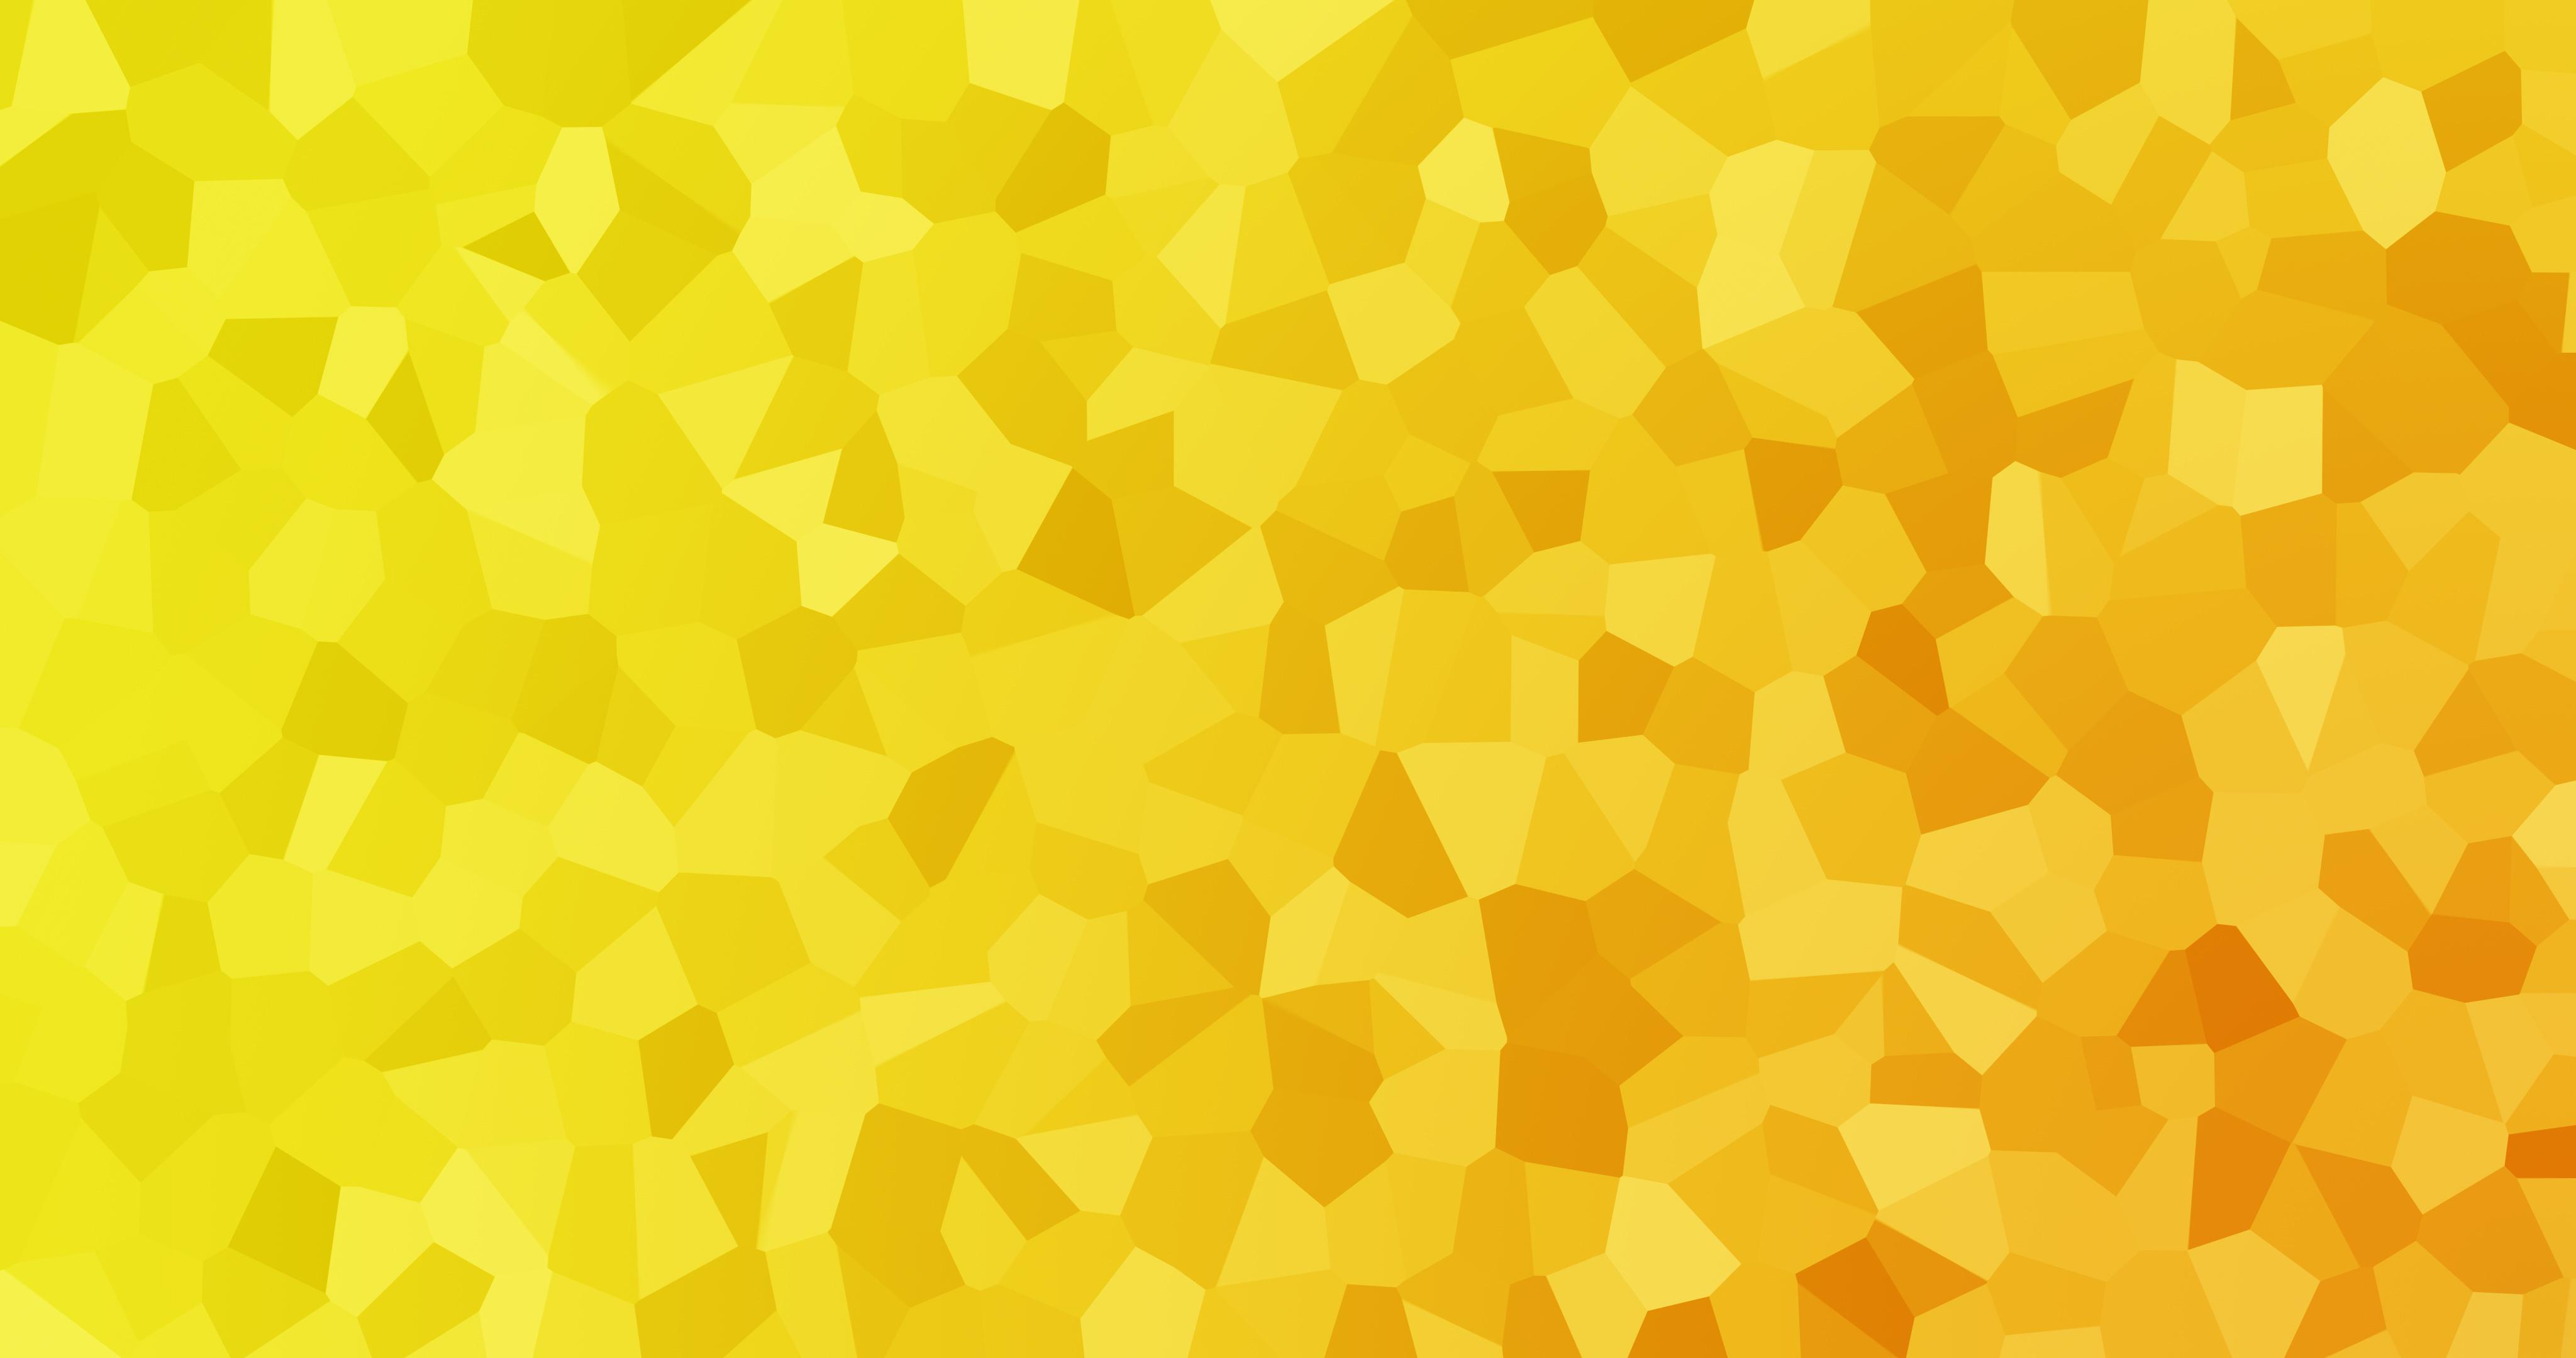 Yellow 4k Ultra Hd Wallpaper Fondo Amarillo Hd 4k 291287